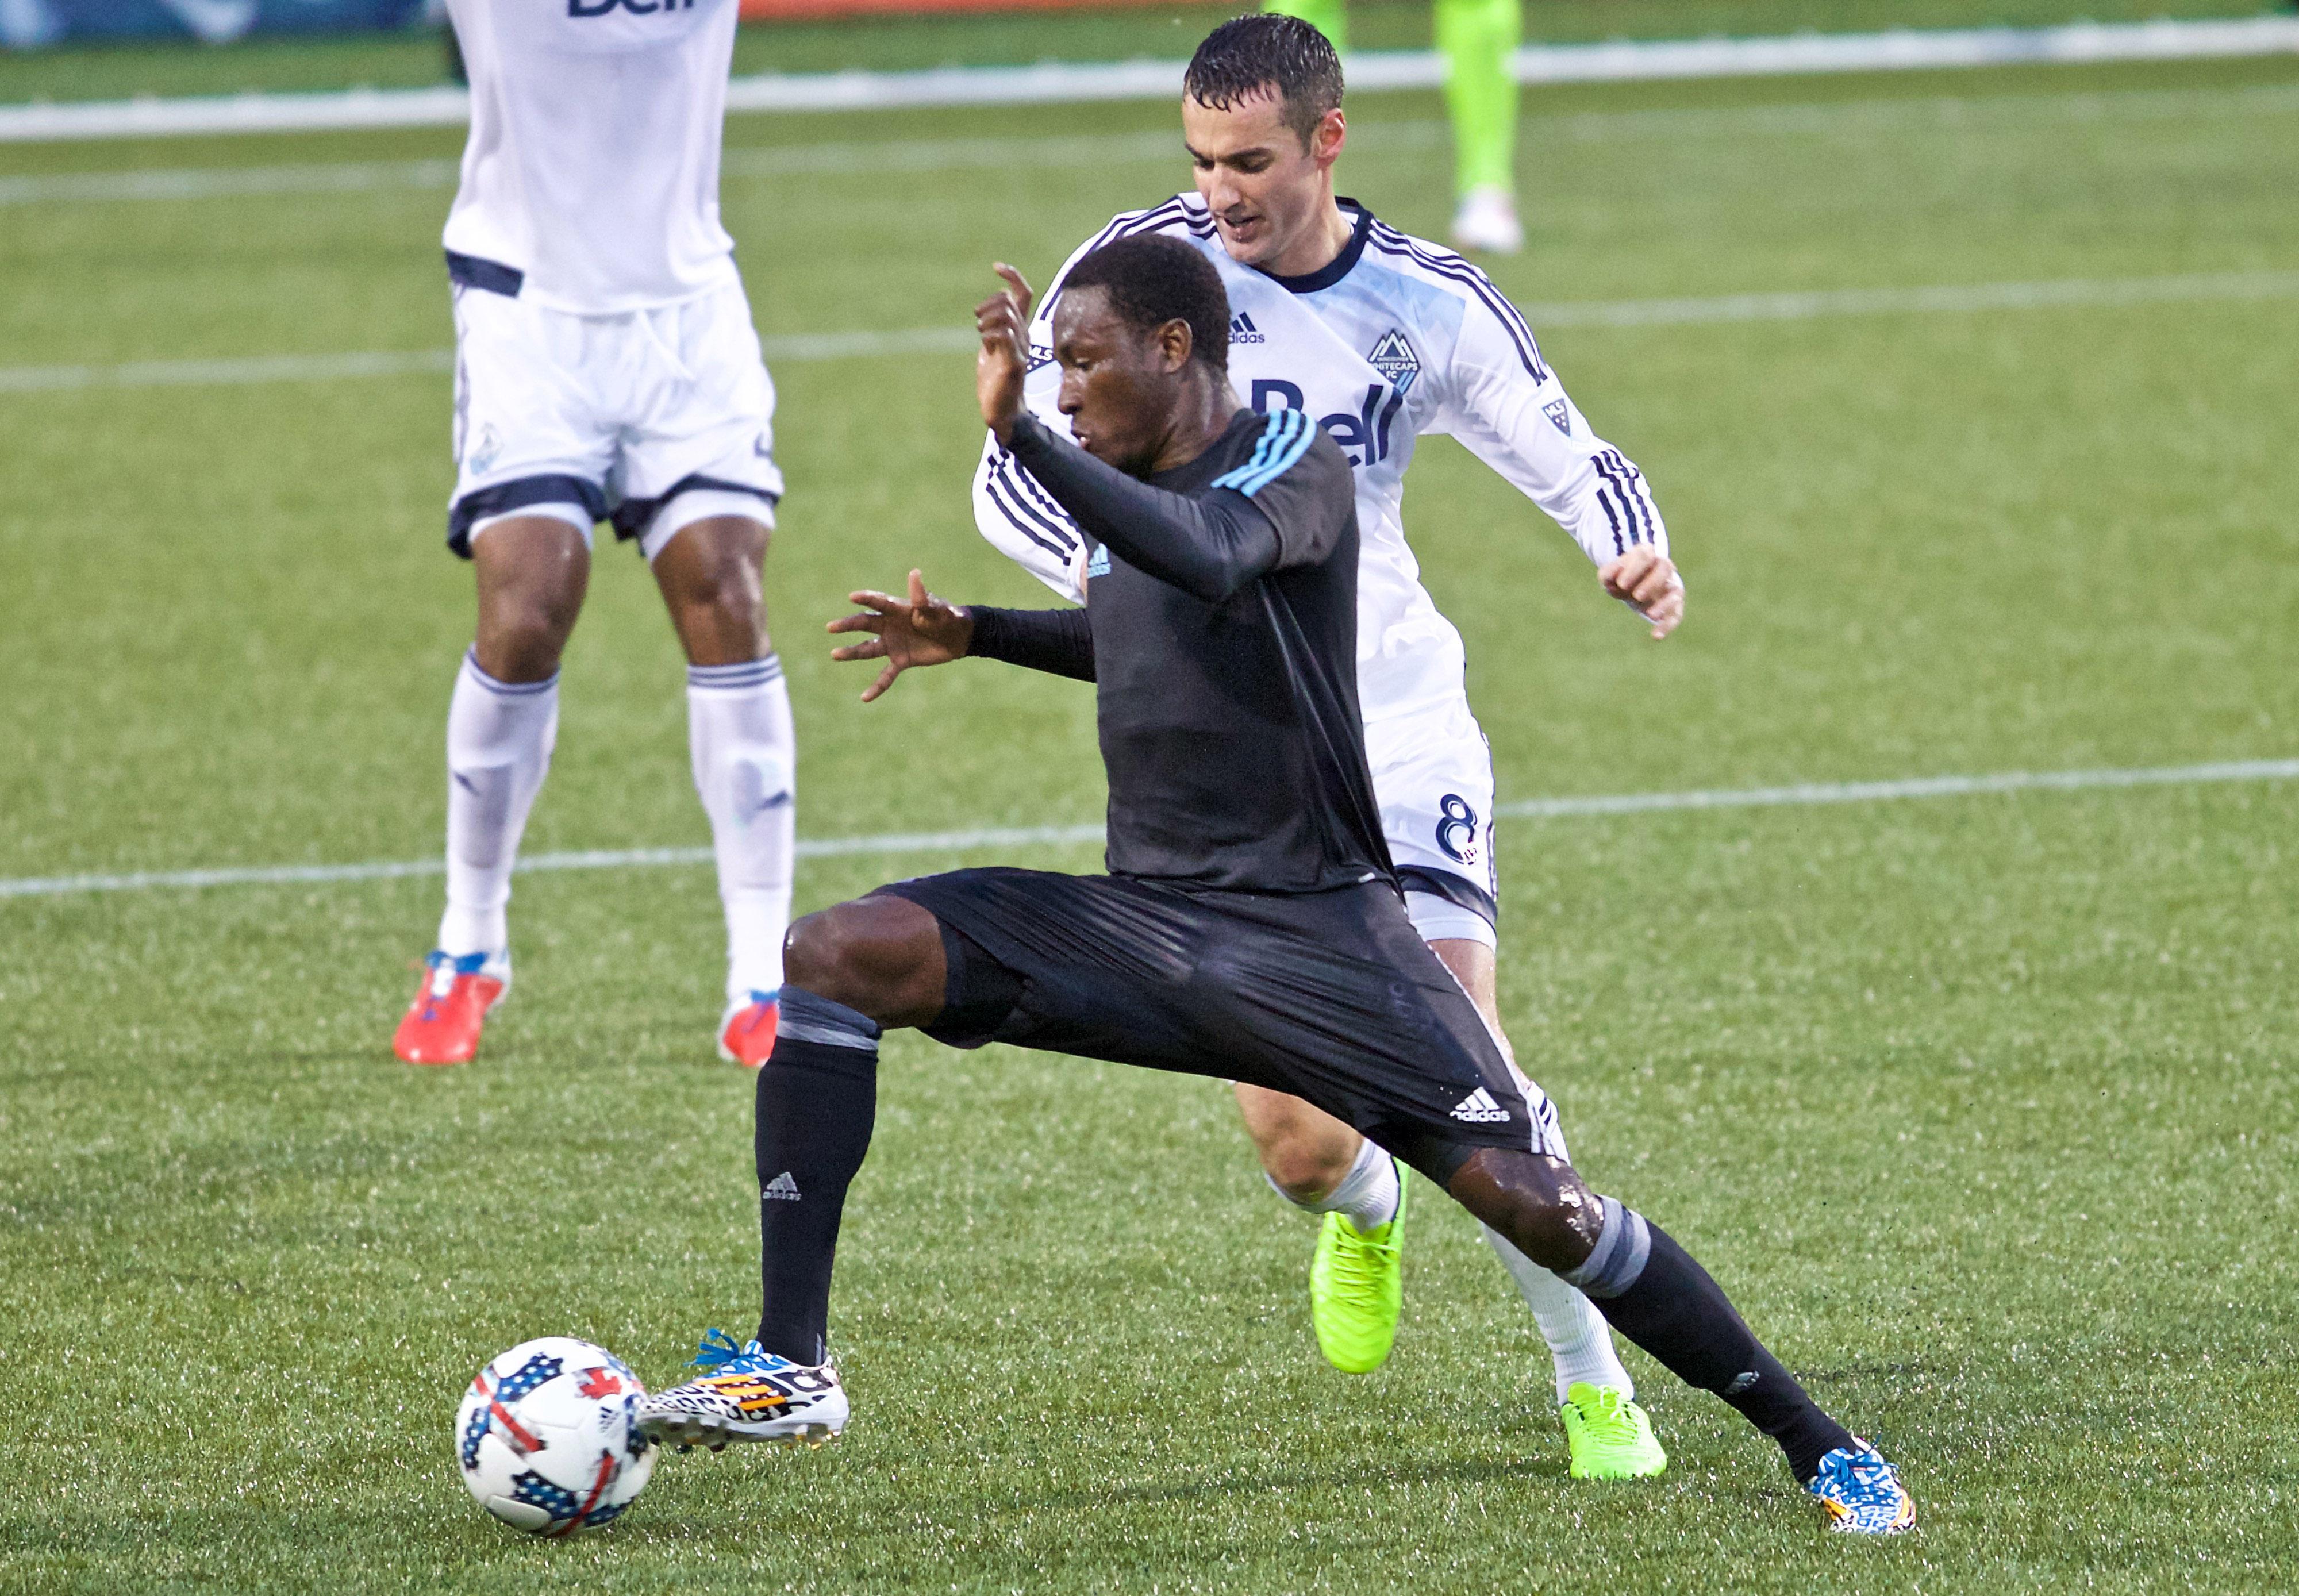 MLS: Minnesota United FC vs Vancouver Whitecaps